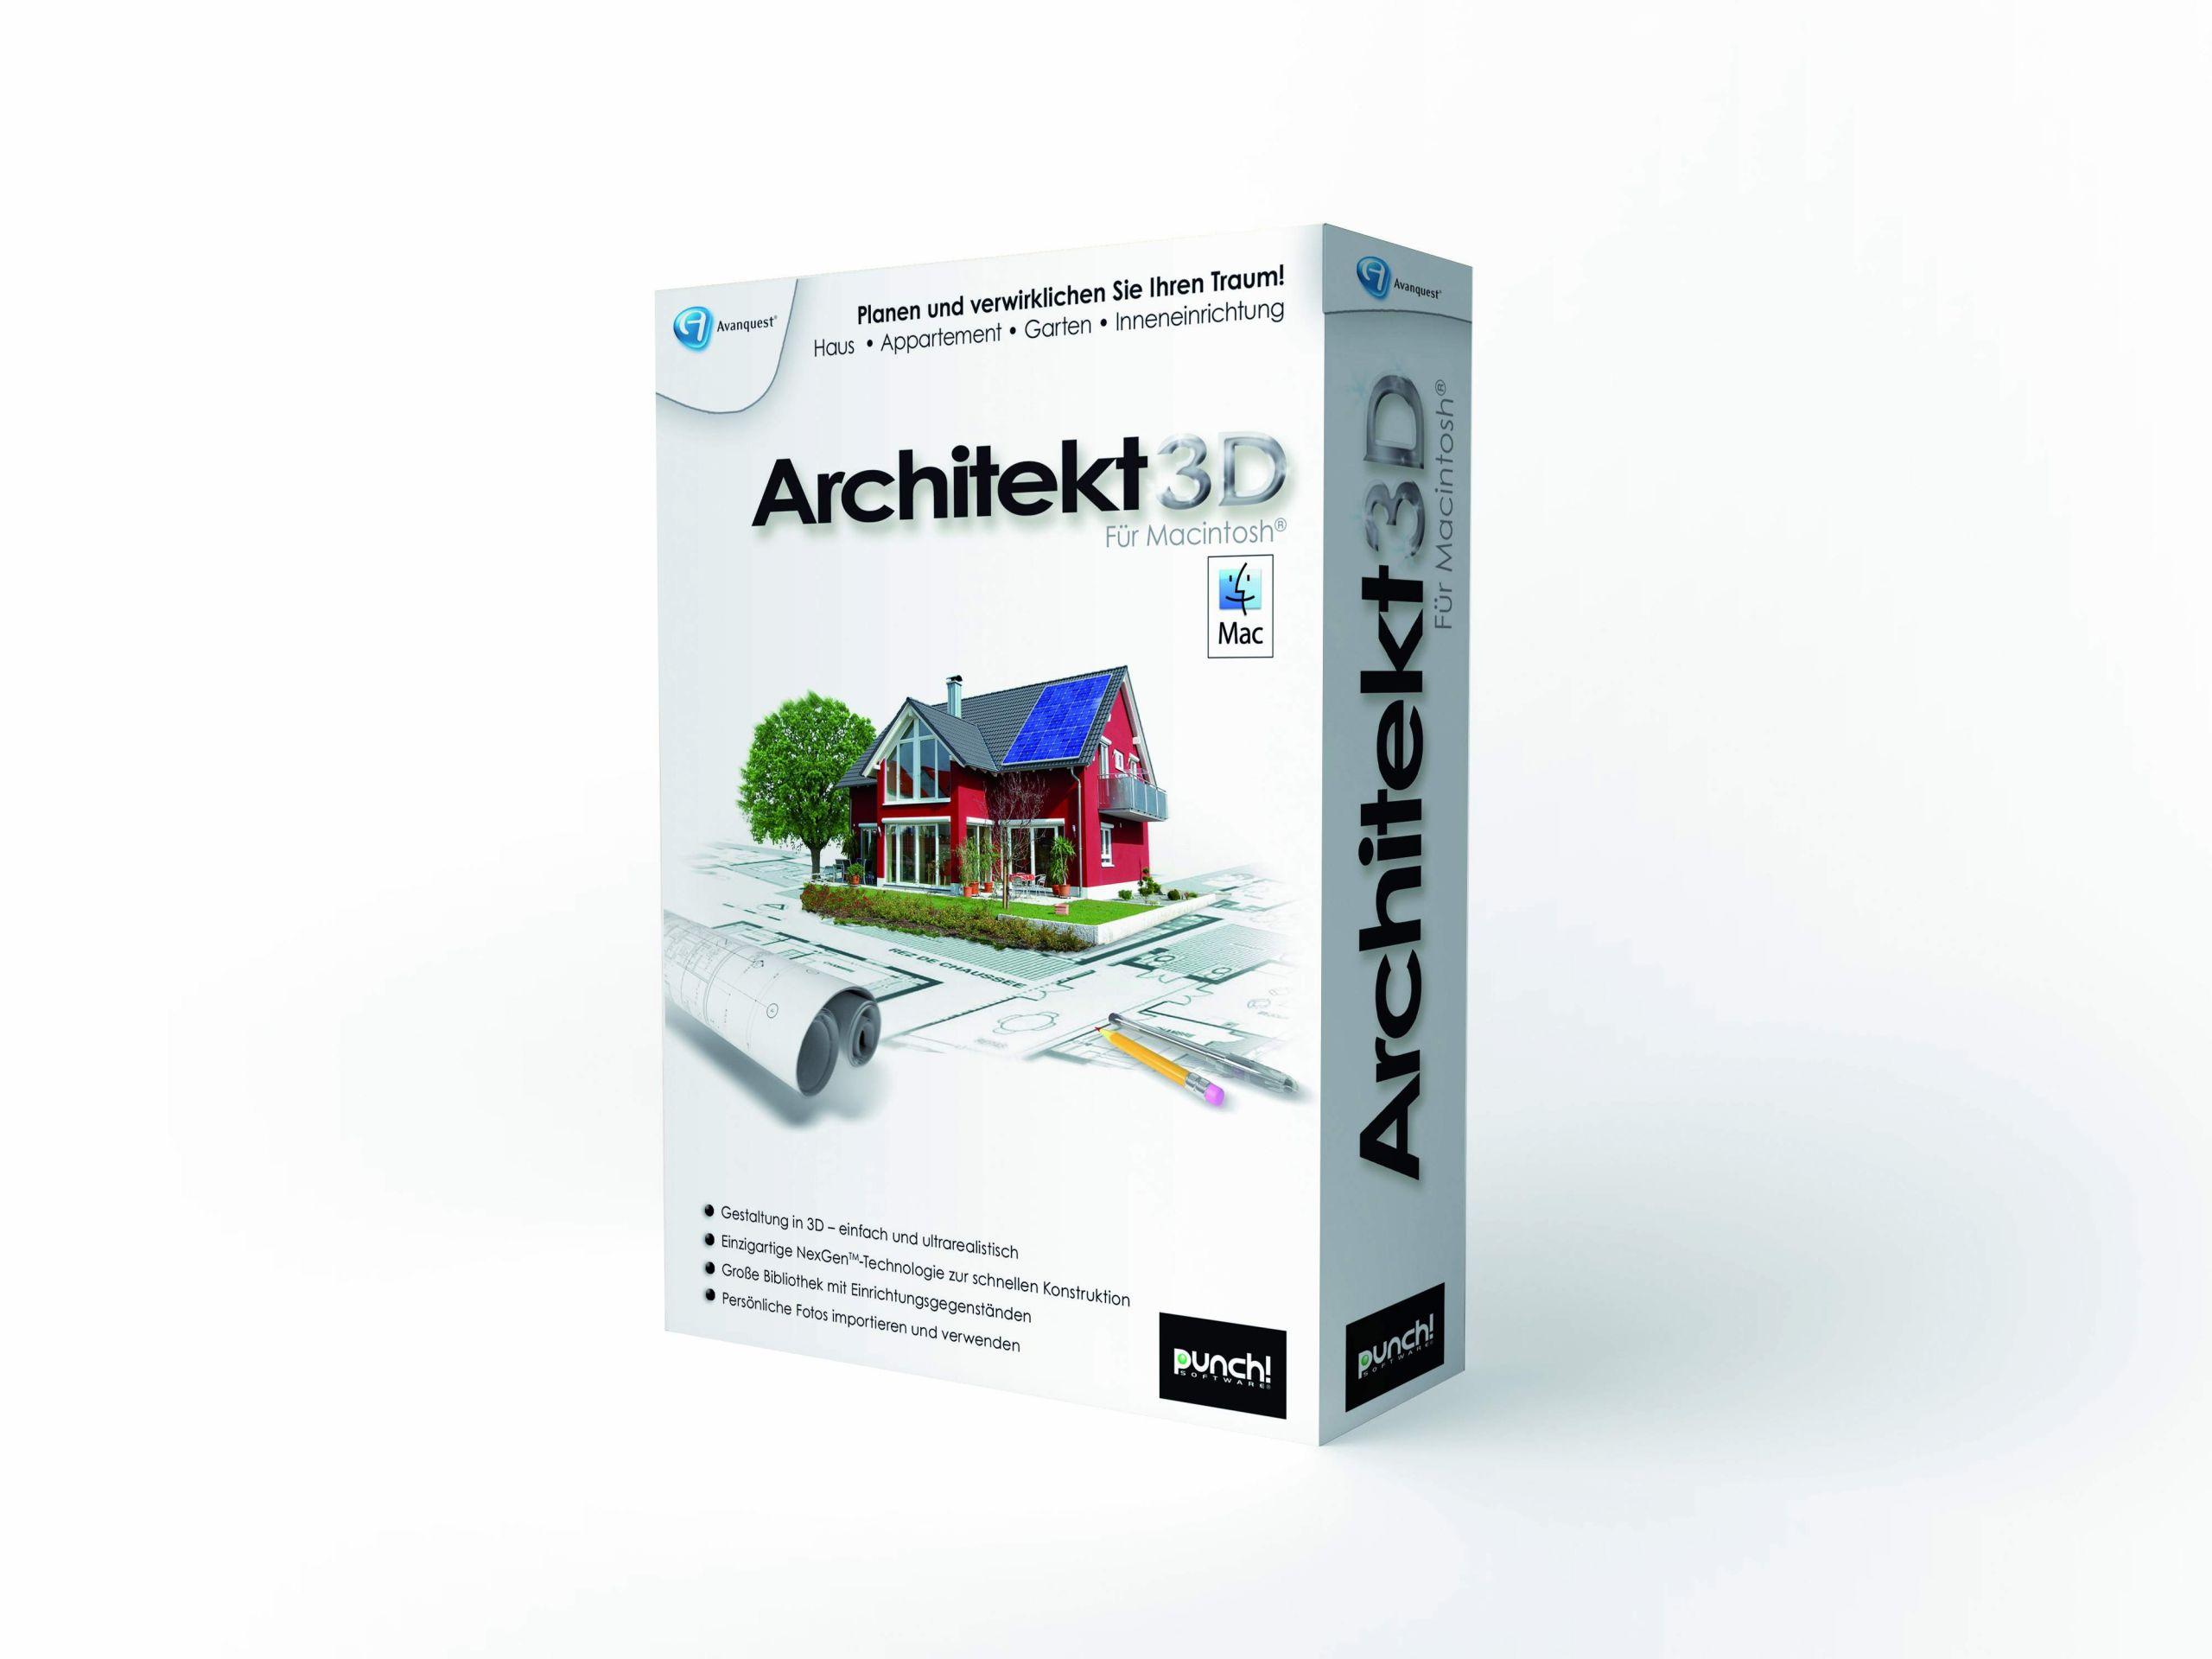 architekt 3d mac 3d front rechts 300dpi cmyk